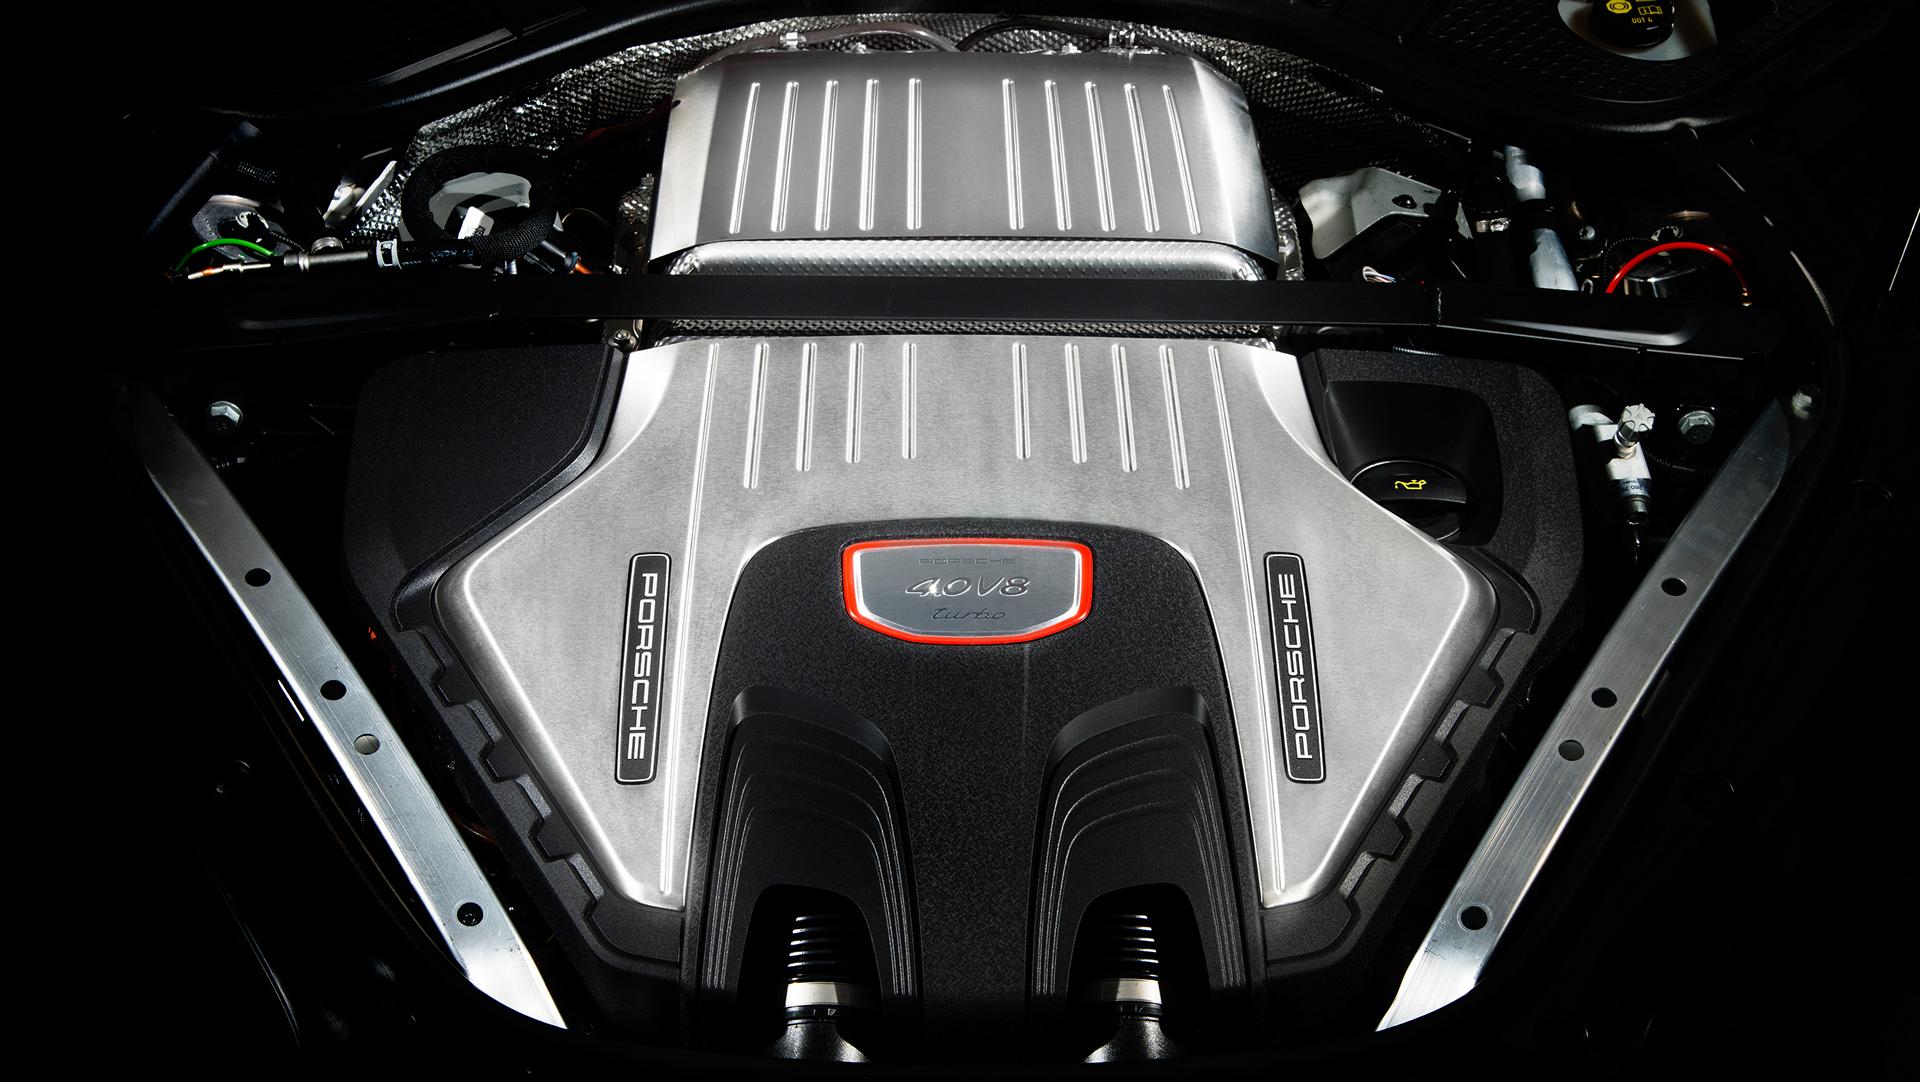 Panamera Turbo © Dr. Ing. h.c. F. Porsche AG